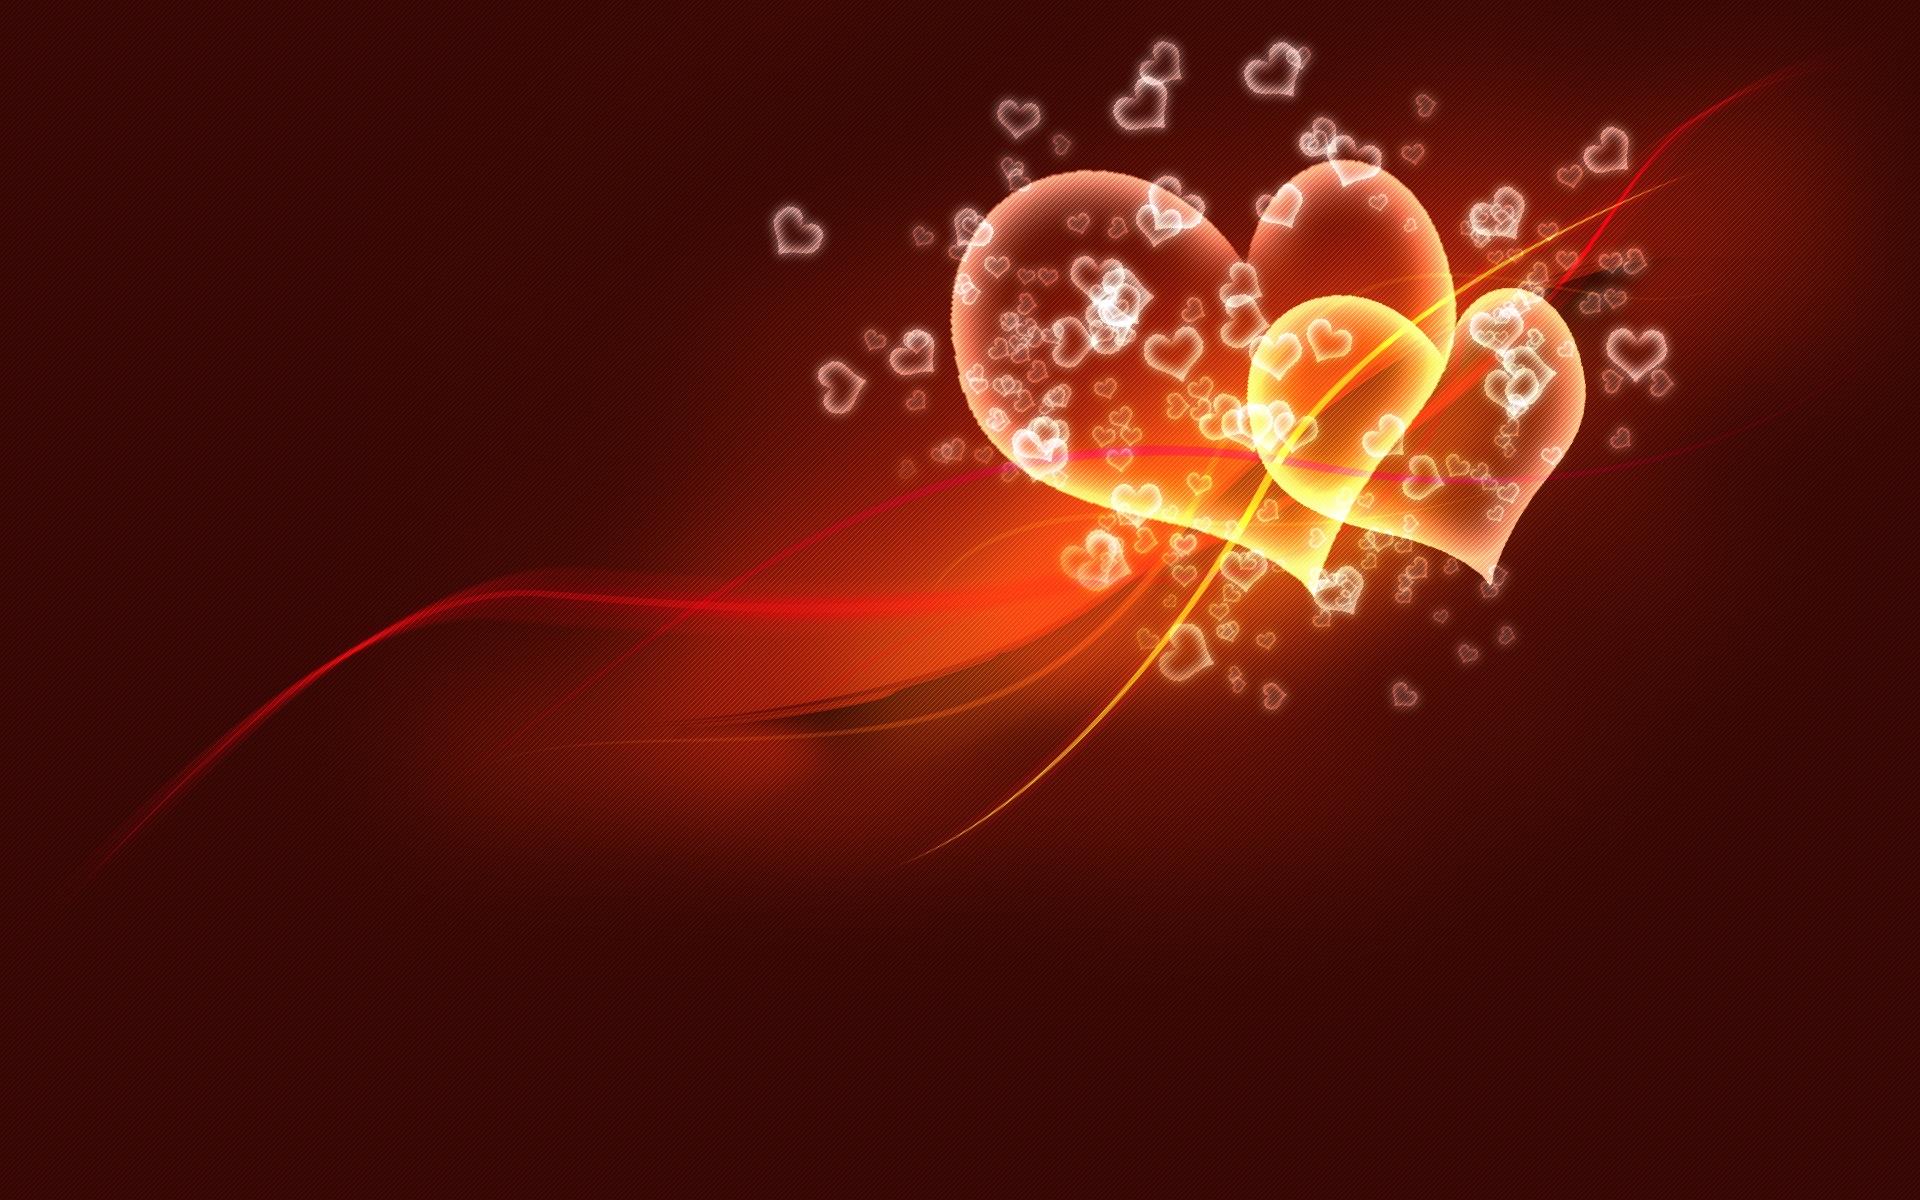 Best Wallpaper Christmas Valentine PPT Background